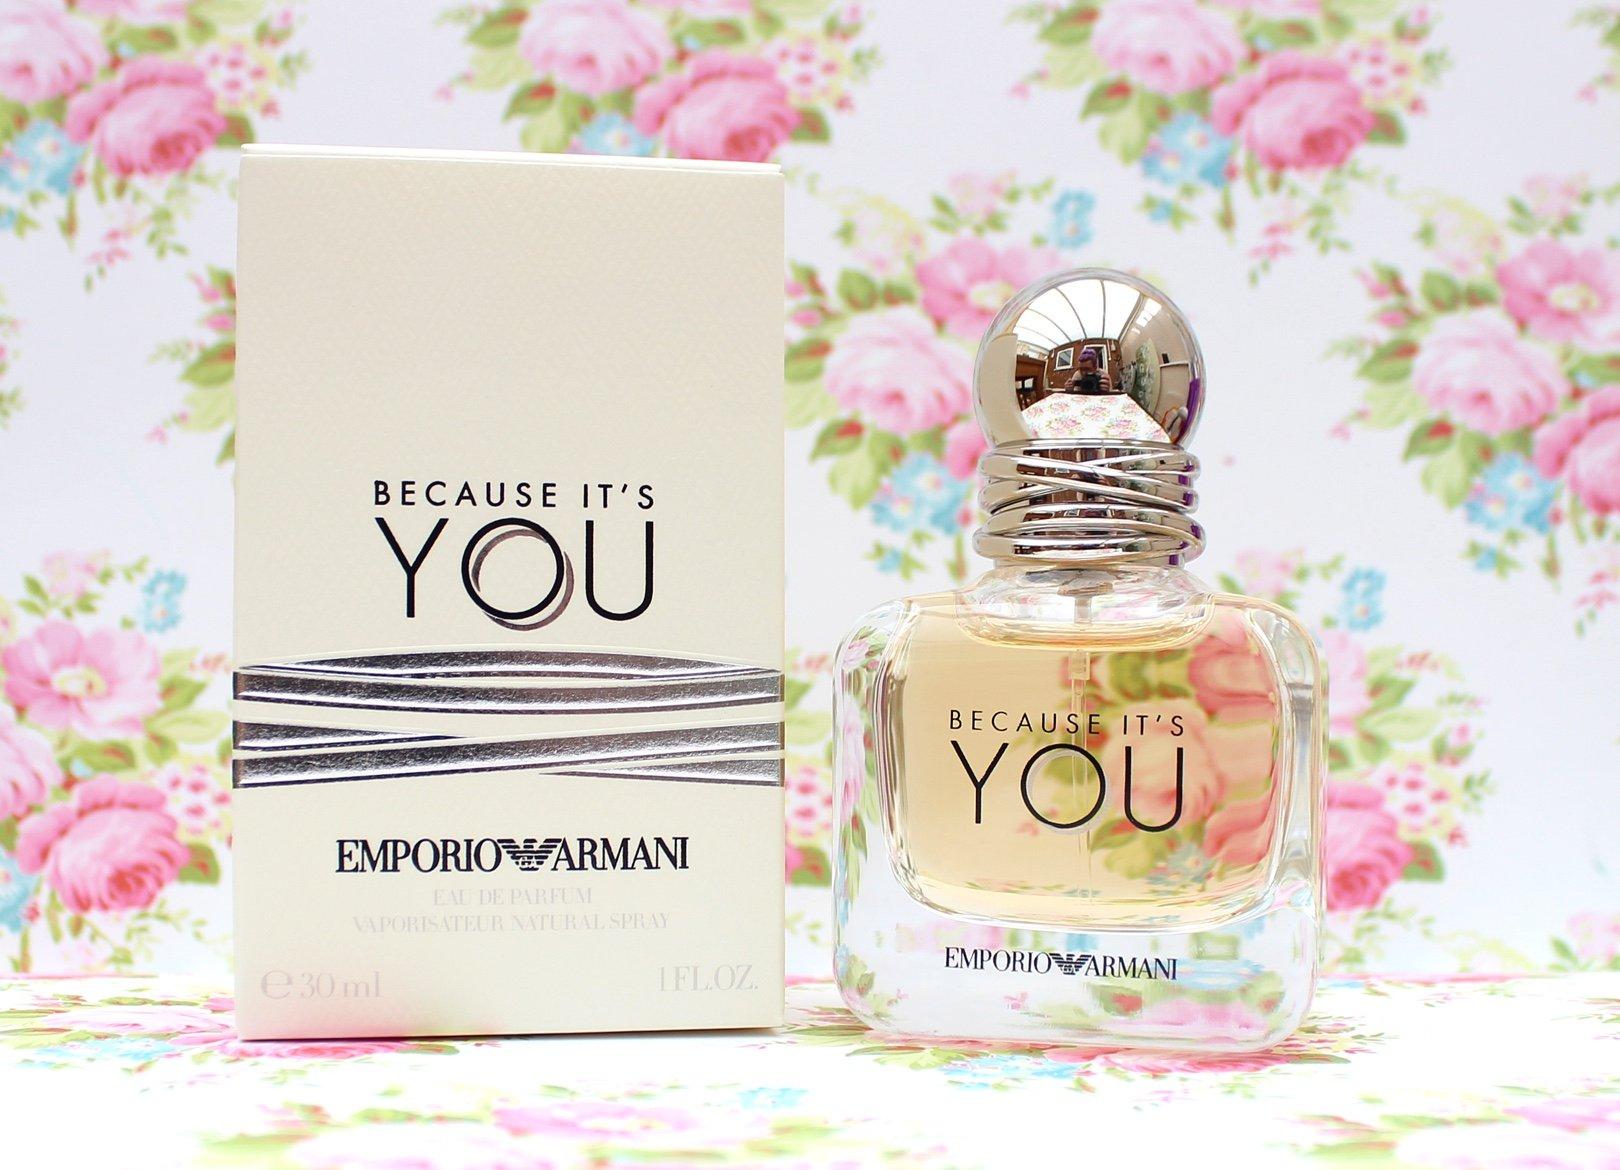 Emporio Armani 'Because it's you' eau de perfume